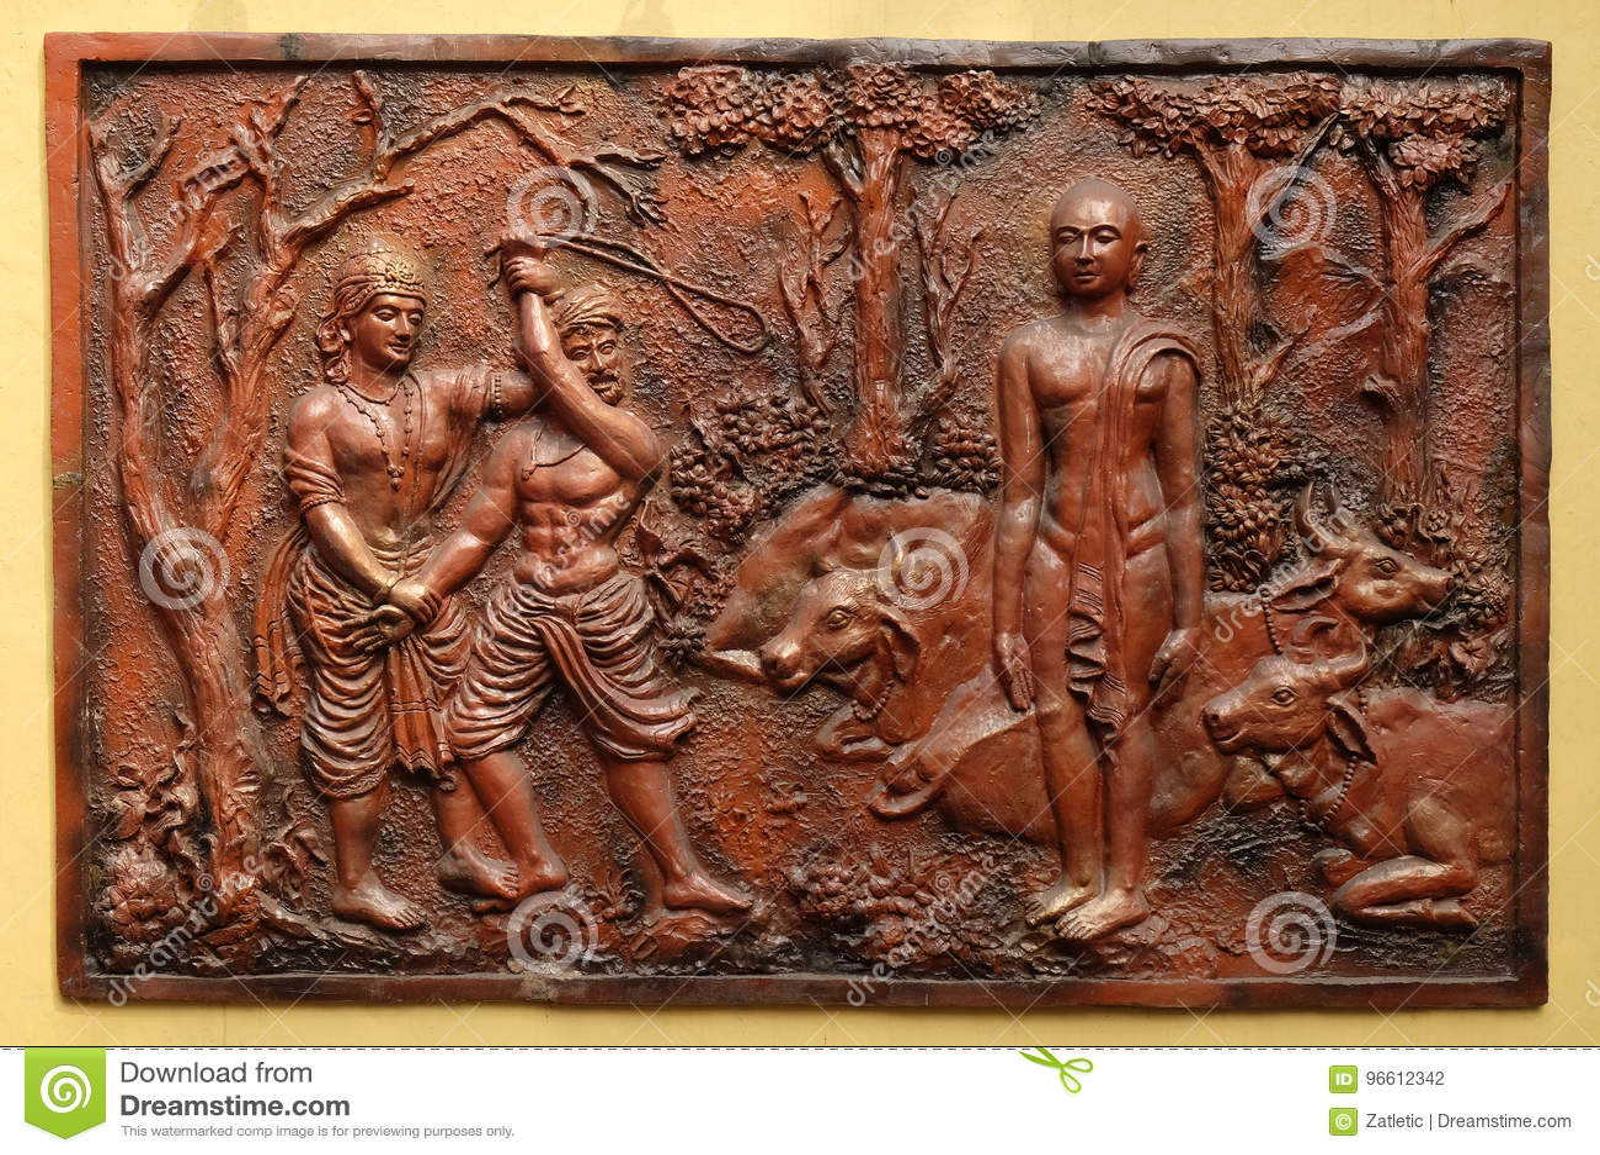 Indra prevents an ignorant cowherd from assaulting Bhagavan Mahavira